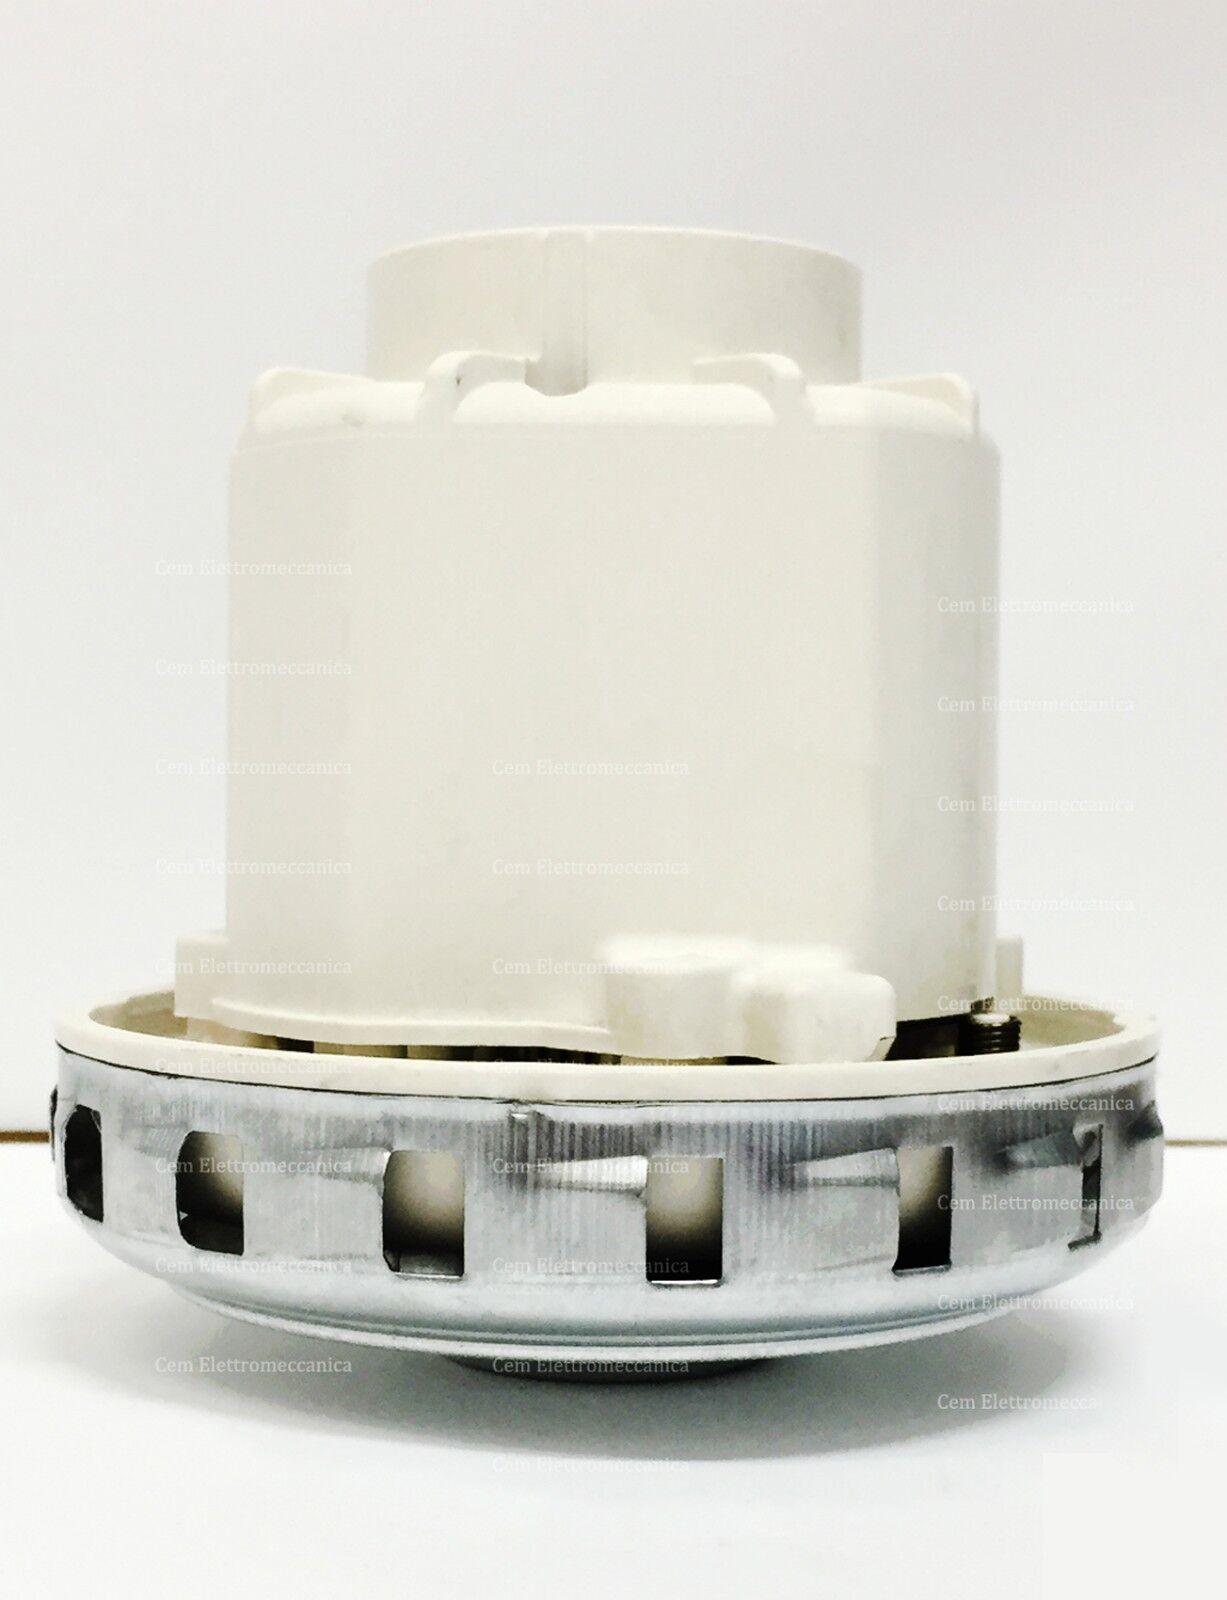 Moteur aspirateur 1350 W Domel 467.3.403-3 per ProugeOOL VCP 170 E